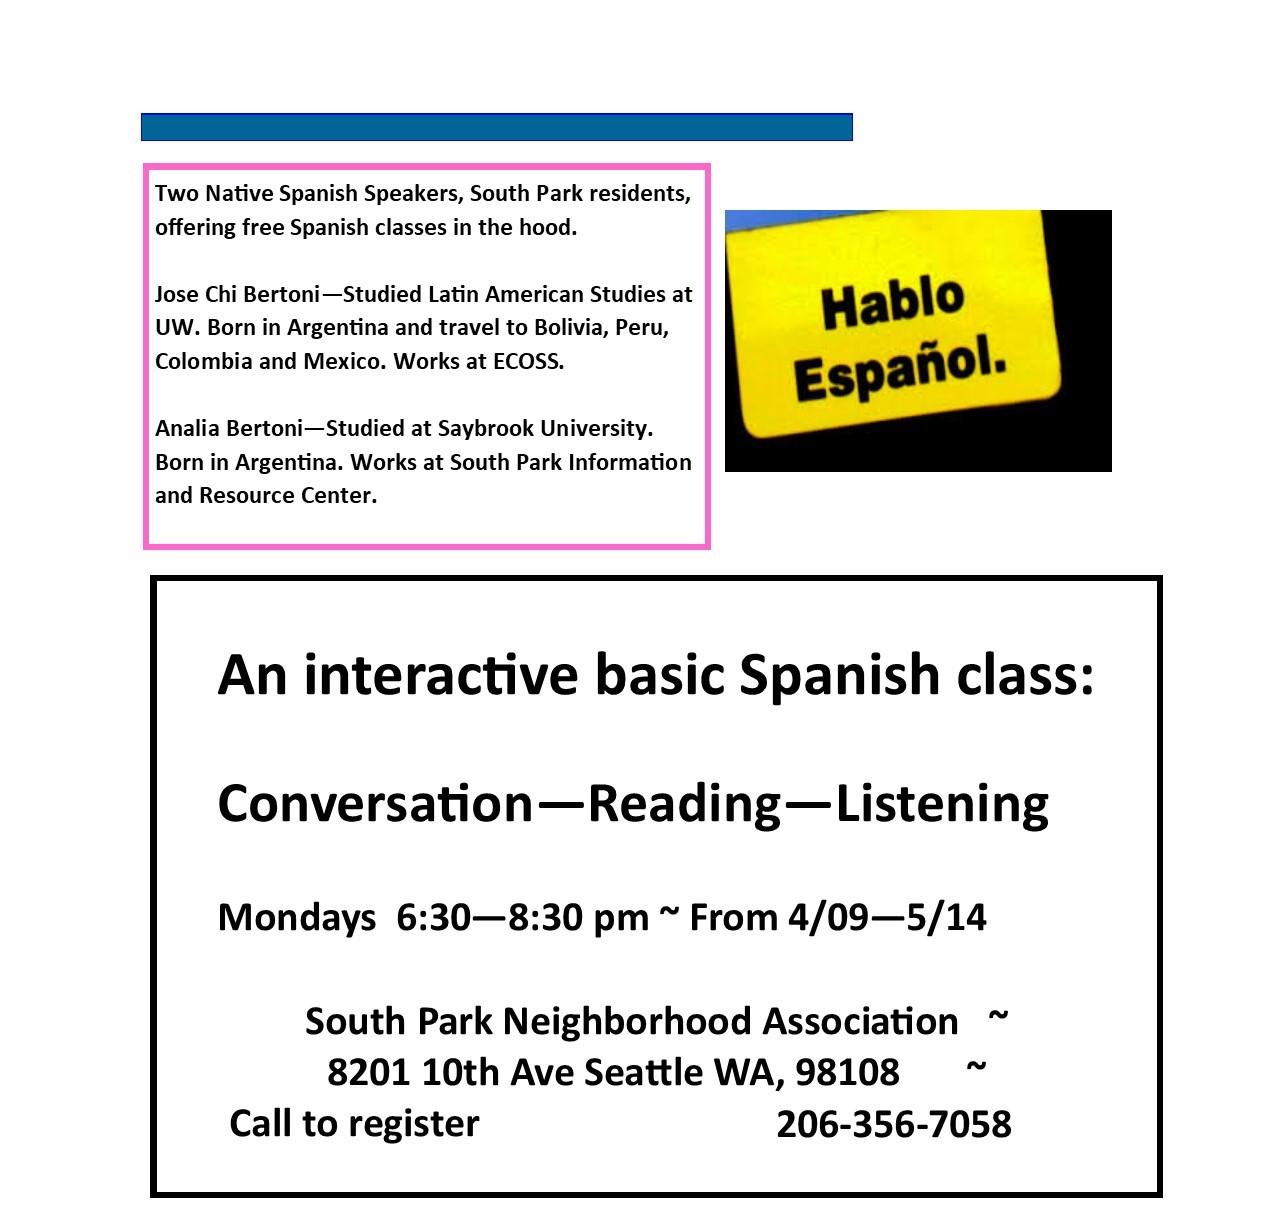 FREE Spanish Lessons! 6:30 - 8:30 pm Mondays